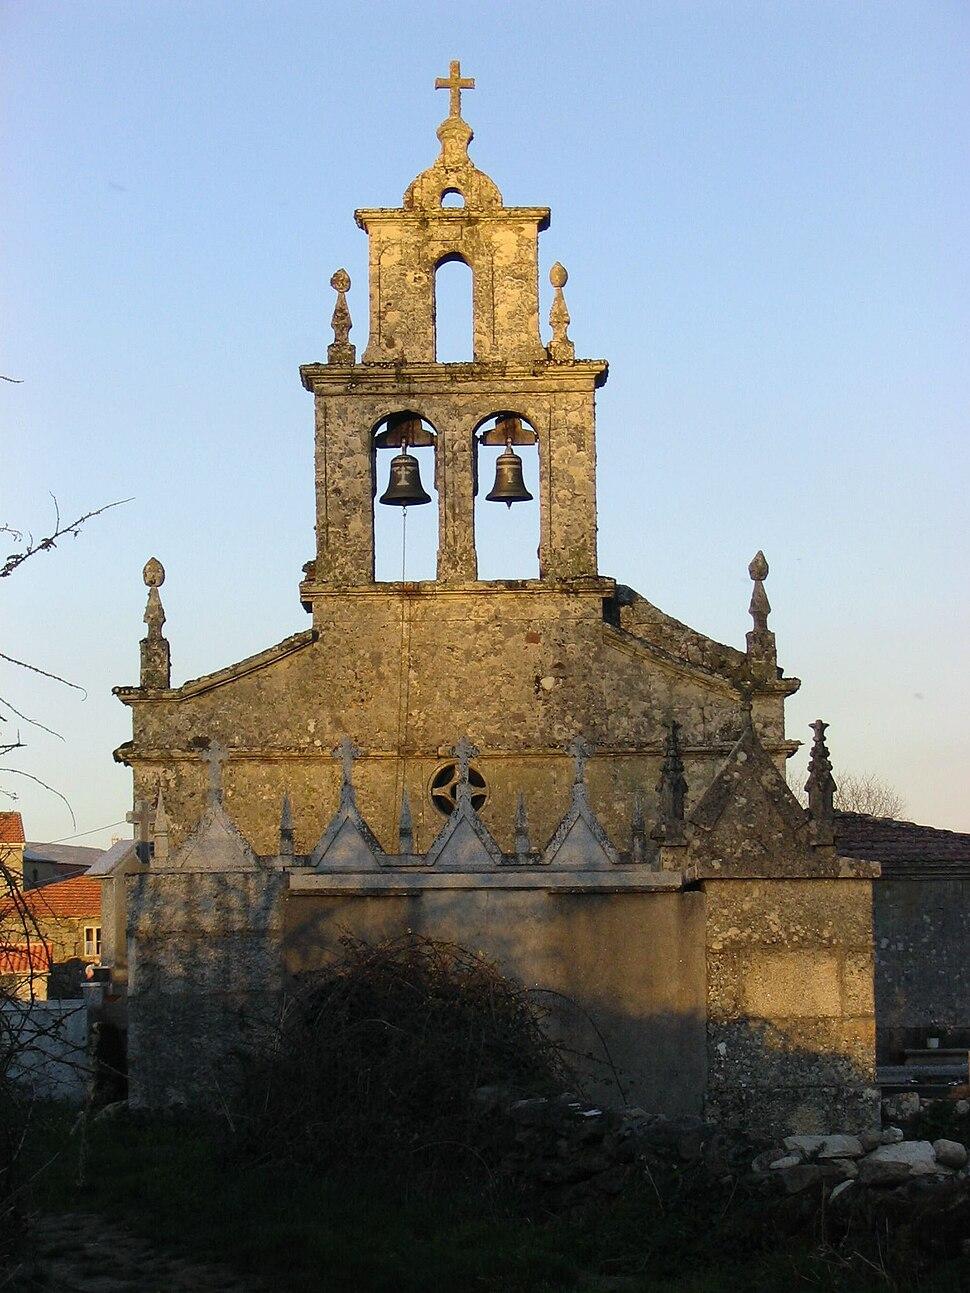 Igrexa en Laza